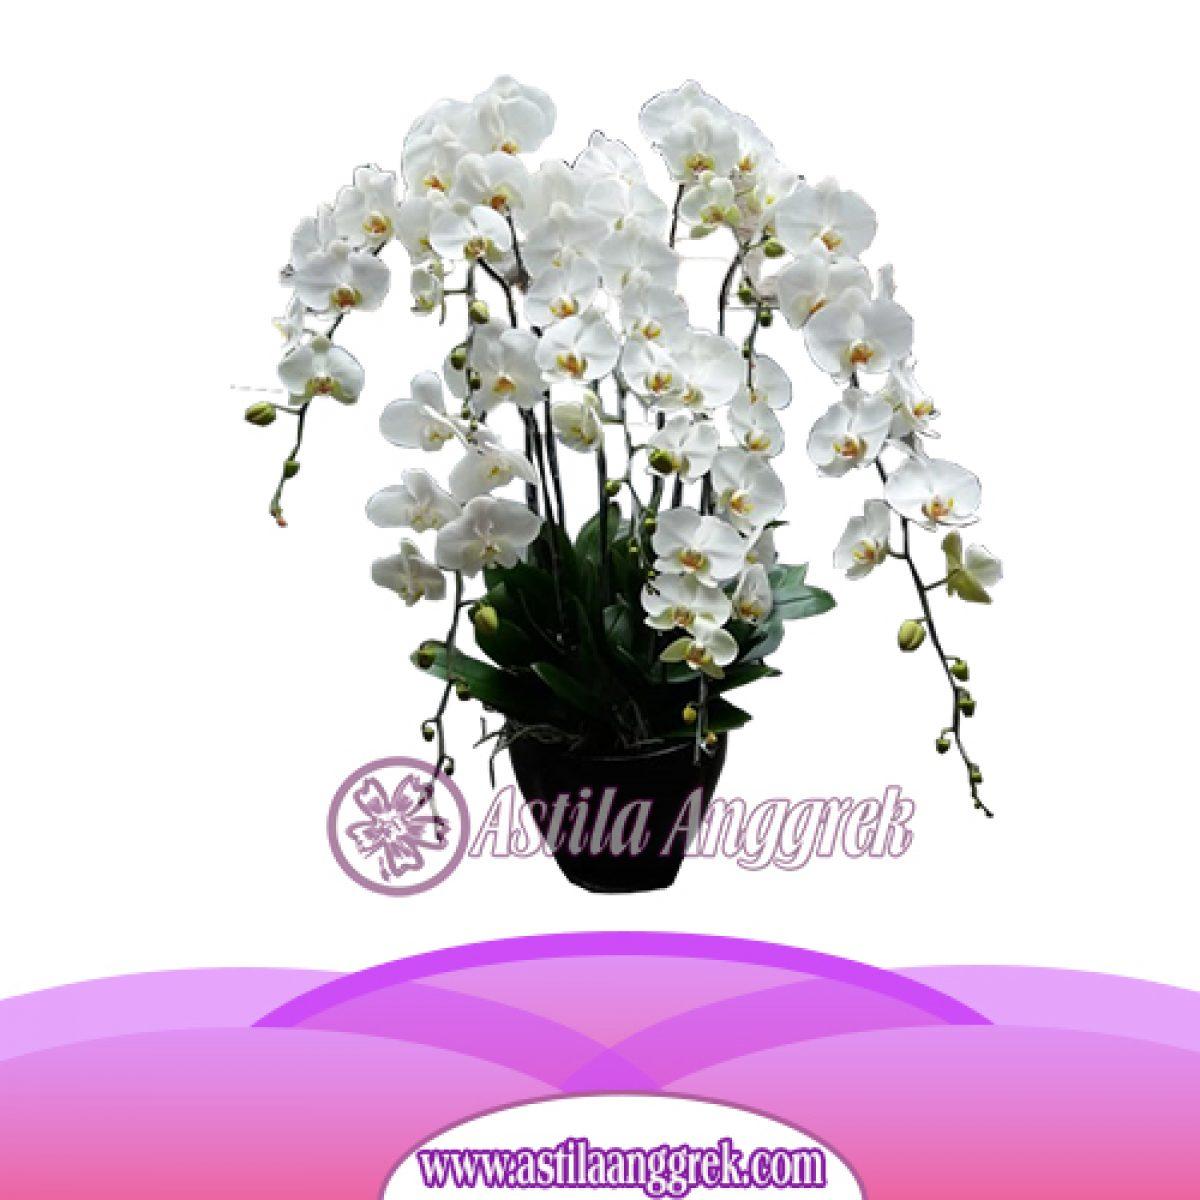 Jual Bunga Anggrek Bulan As Agr 009 Toko Bunga Anggrek